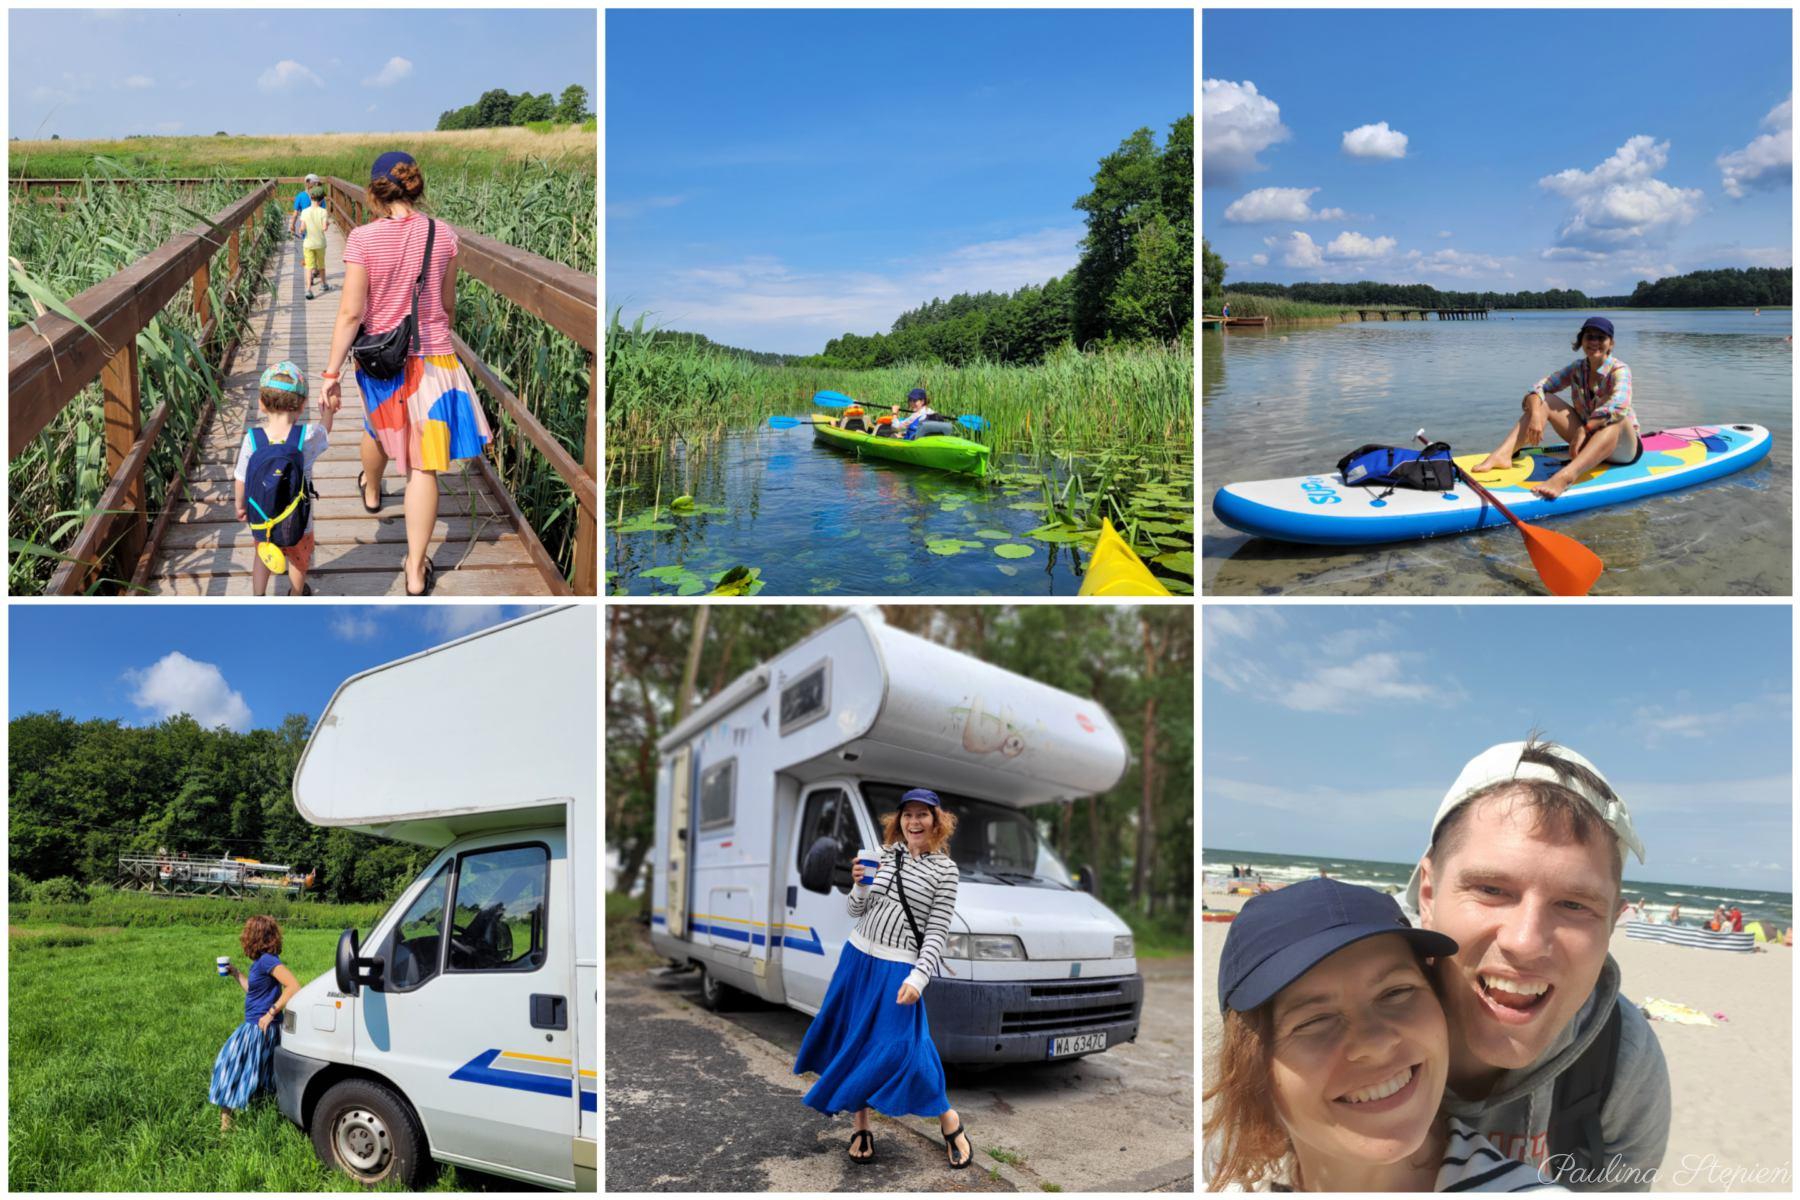 Wyjazd kamperem Polska